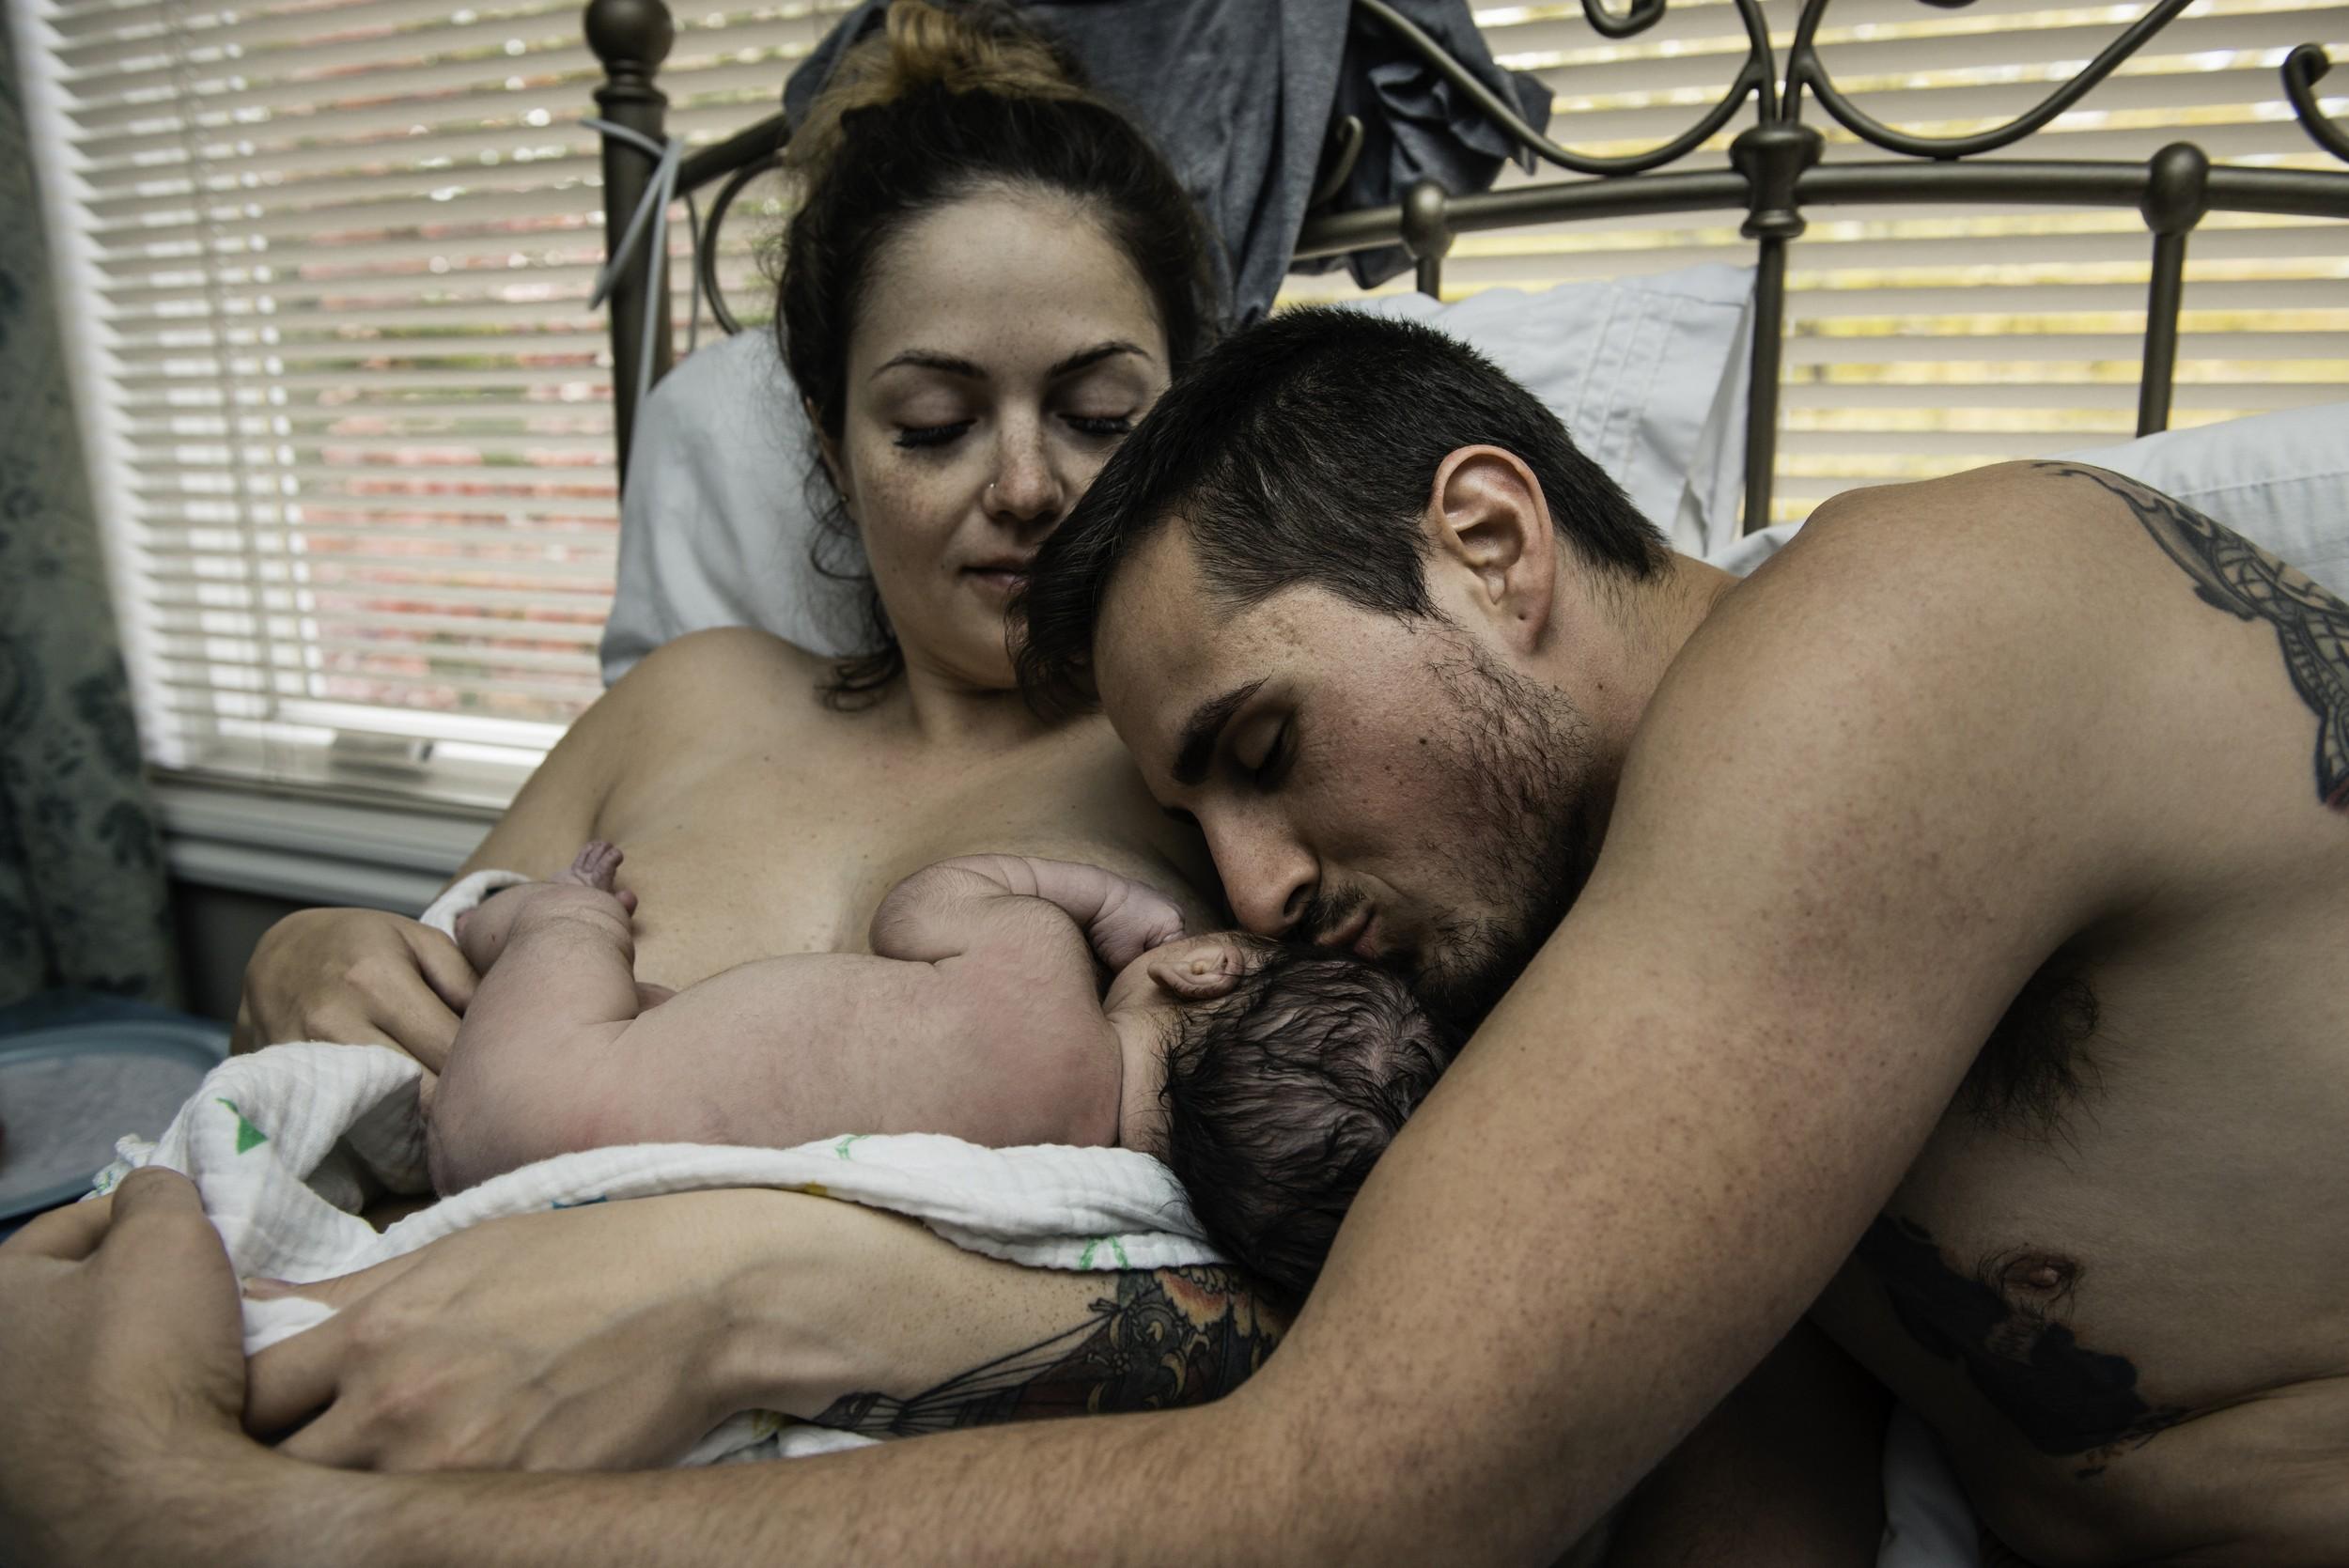 A-waterbirth-story-at-the-birth-center-in-Murray-utah-salt-lake-city-birth-photographer-birth-videography,-natural-birth,-homebirth-67.jpg